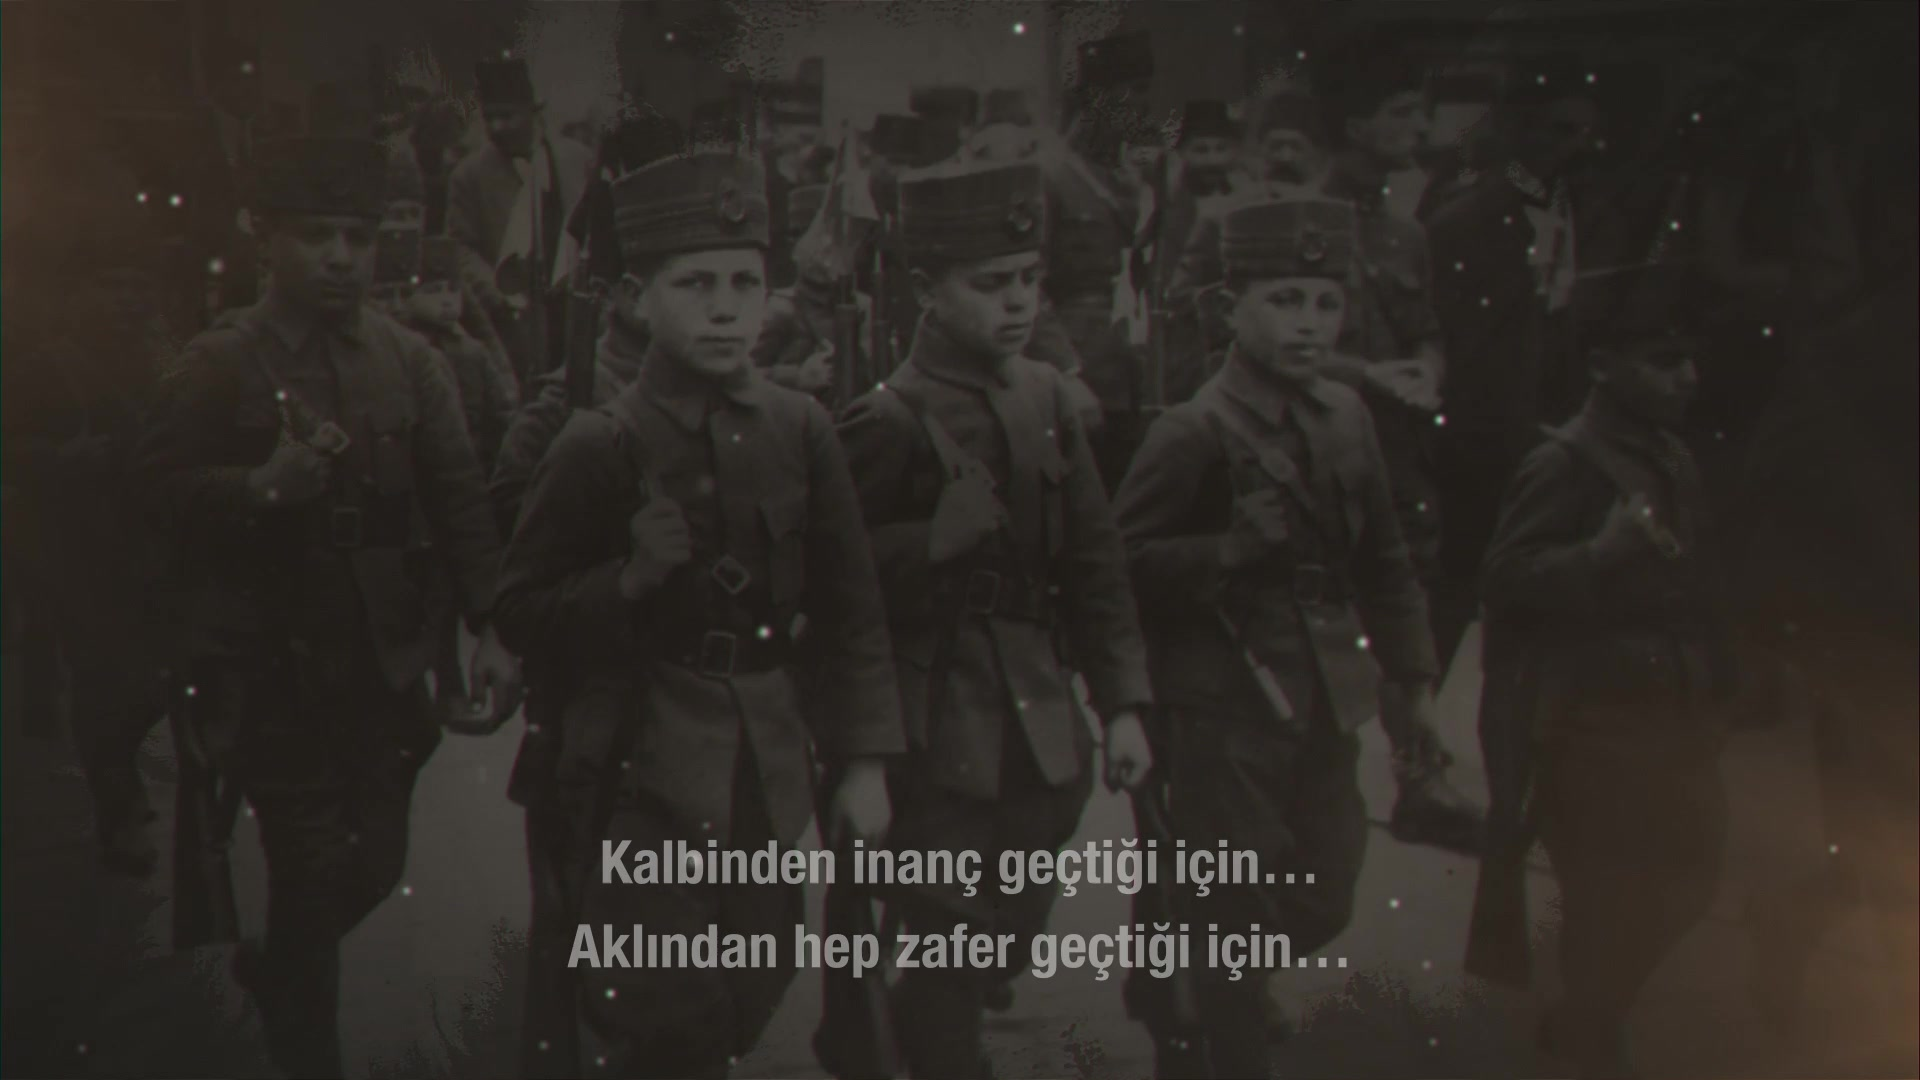 Borusan.Mannesmann Boru San. ve Tic. A.Ş.